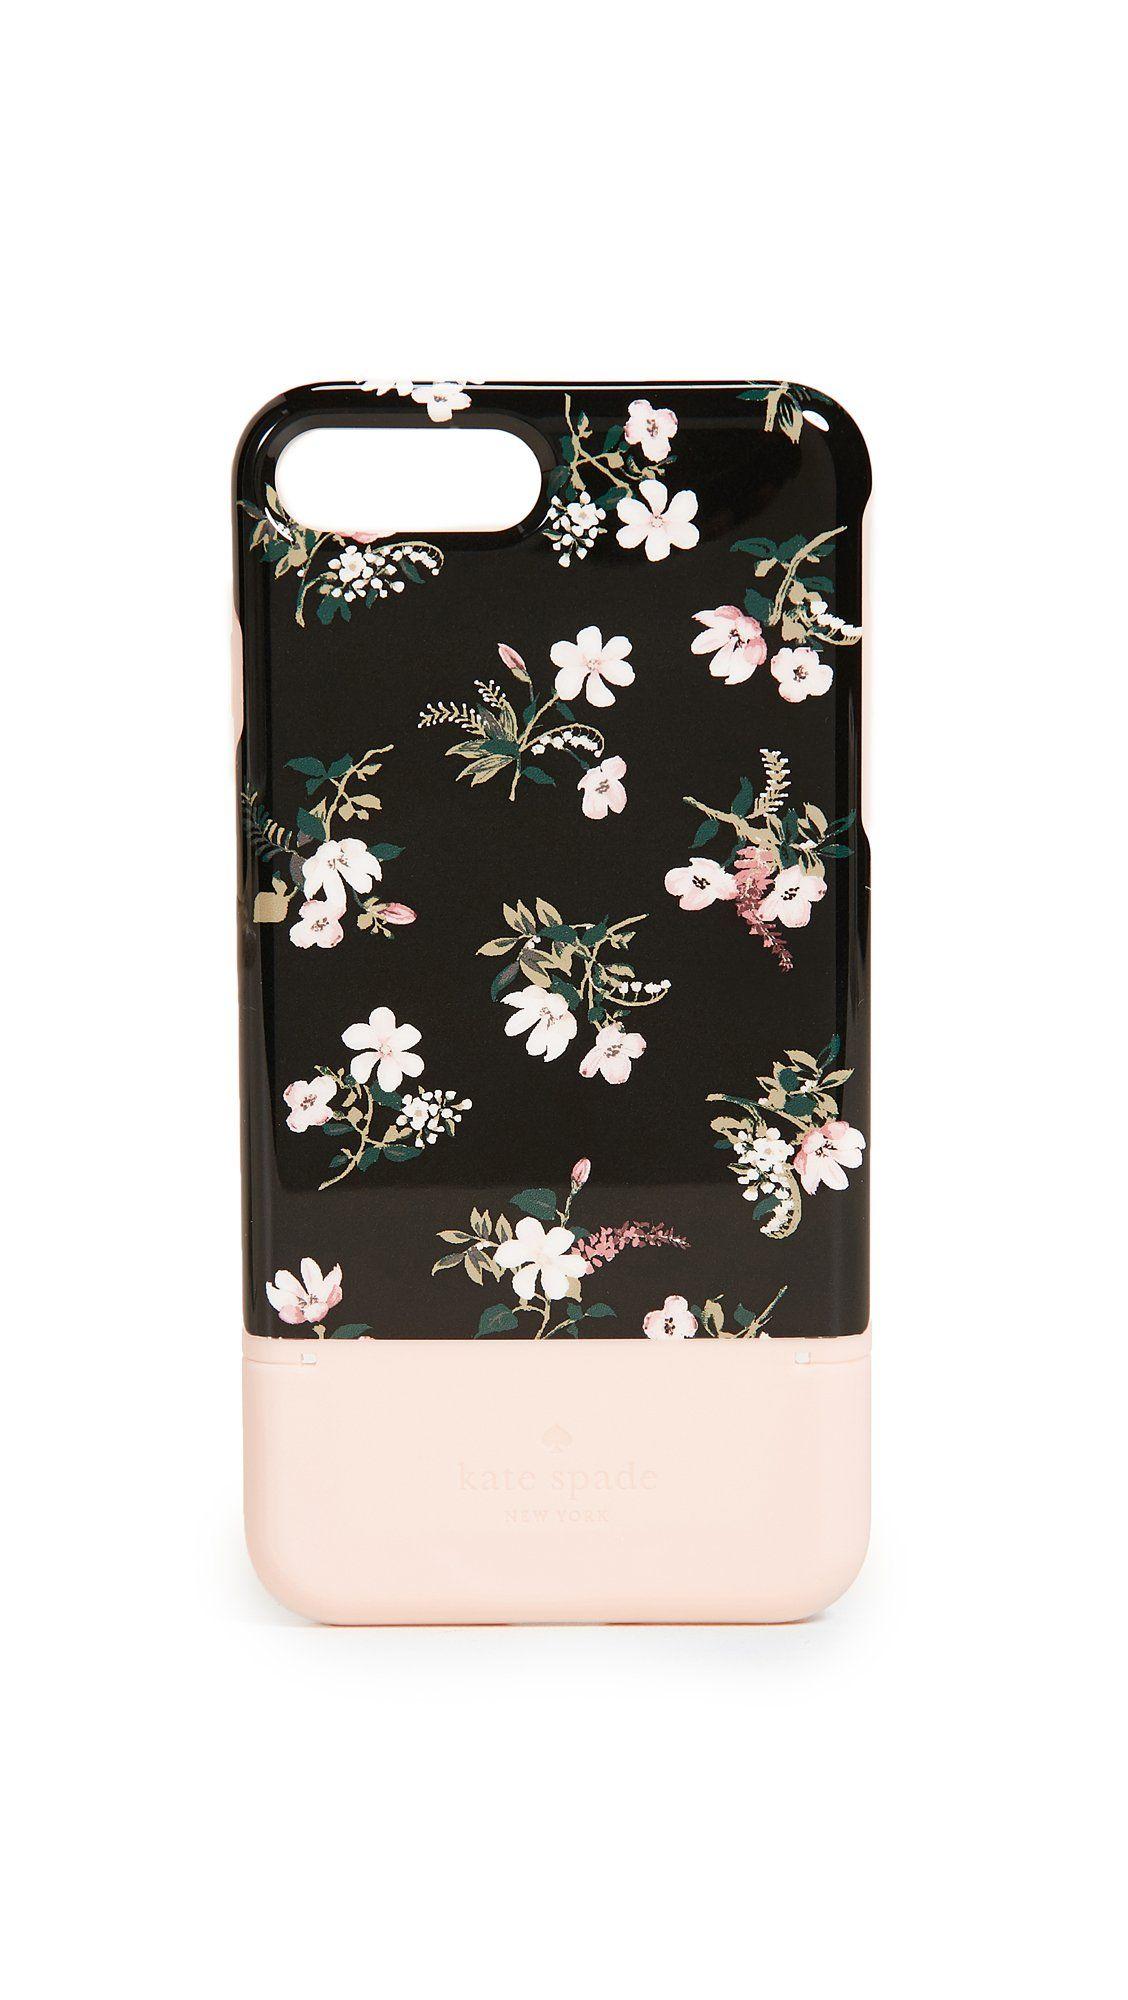 Kate spade new york flora credit card iphone plus case